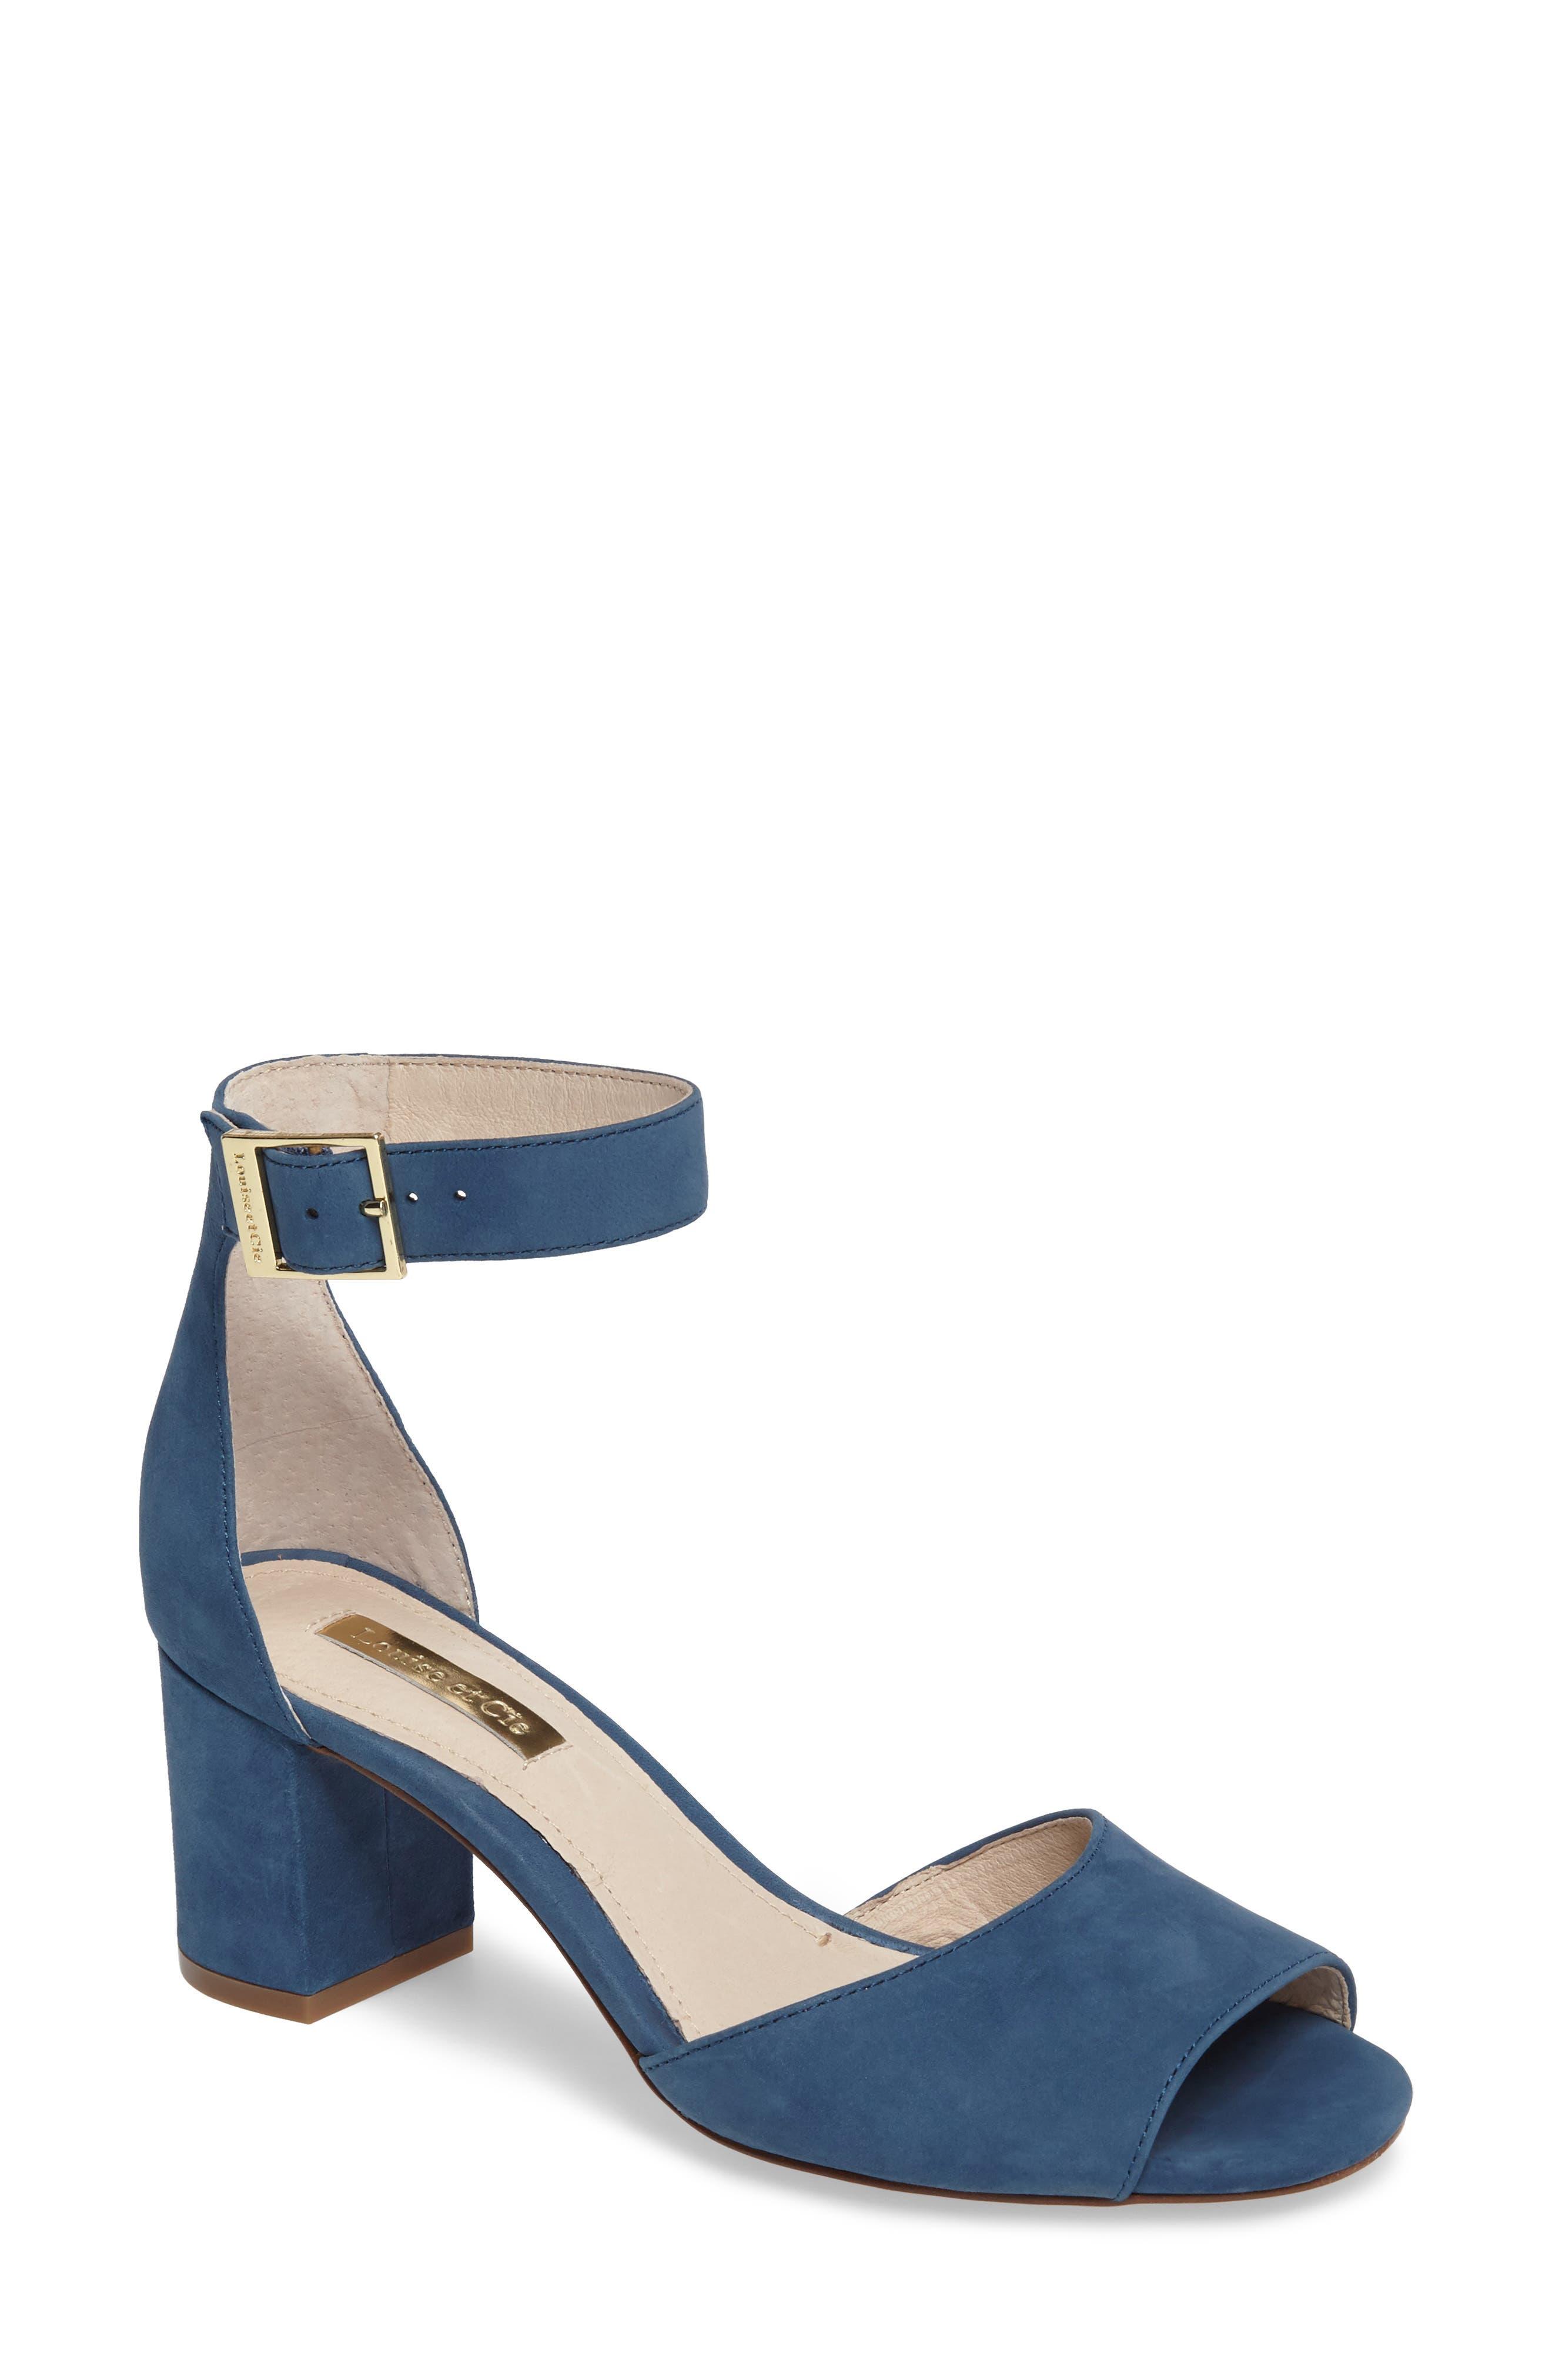 Alternate Image 1 Selected - Louise et Cie Karisa Ankle Cuff Sandal (Women)